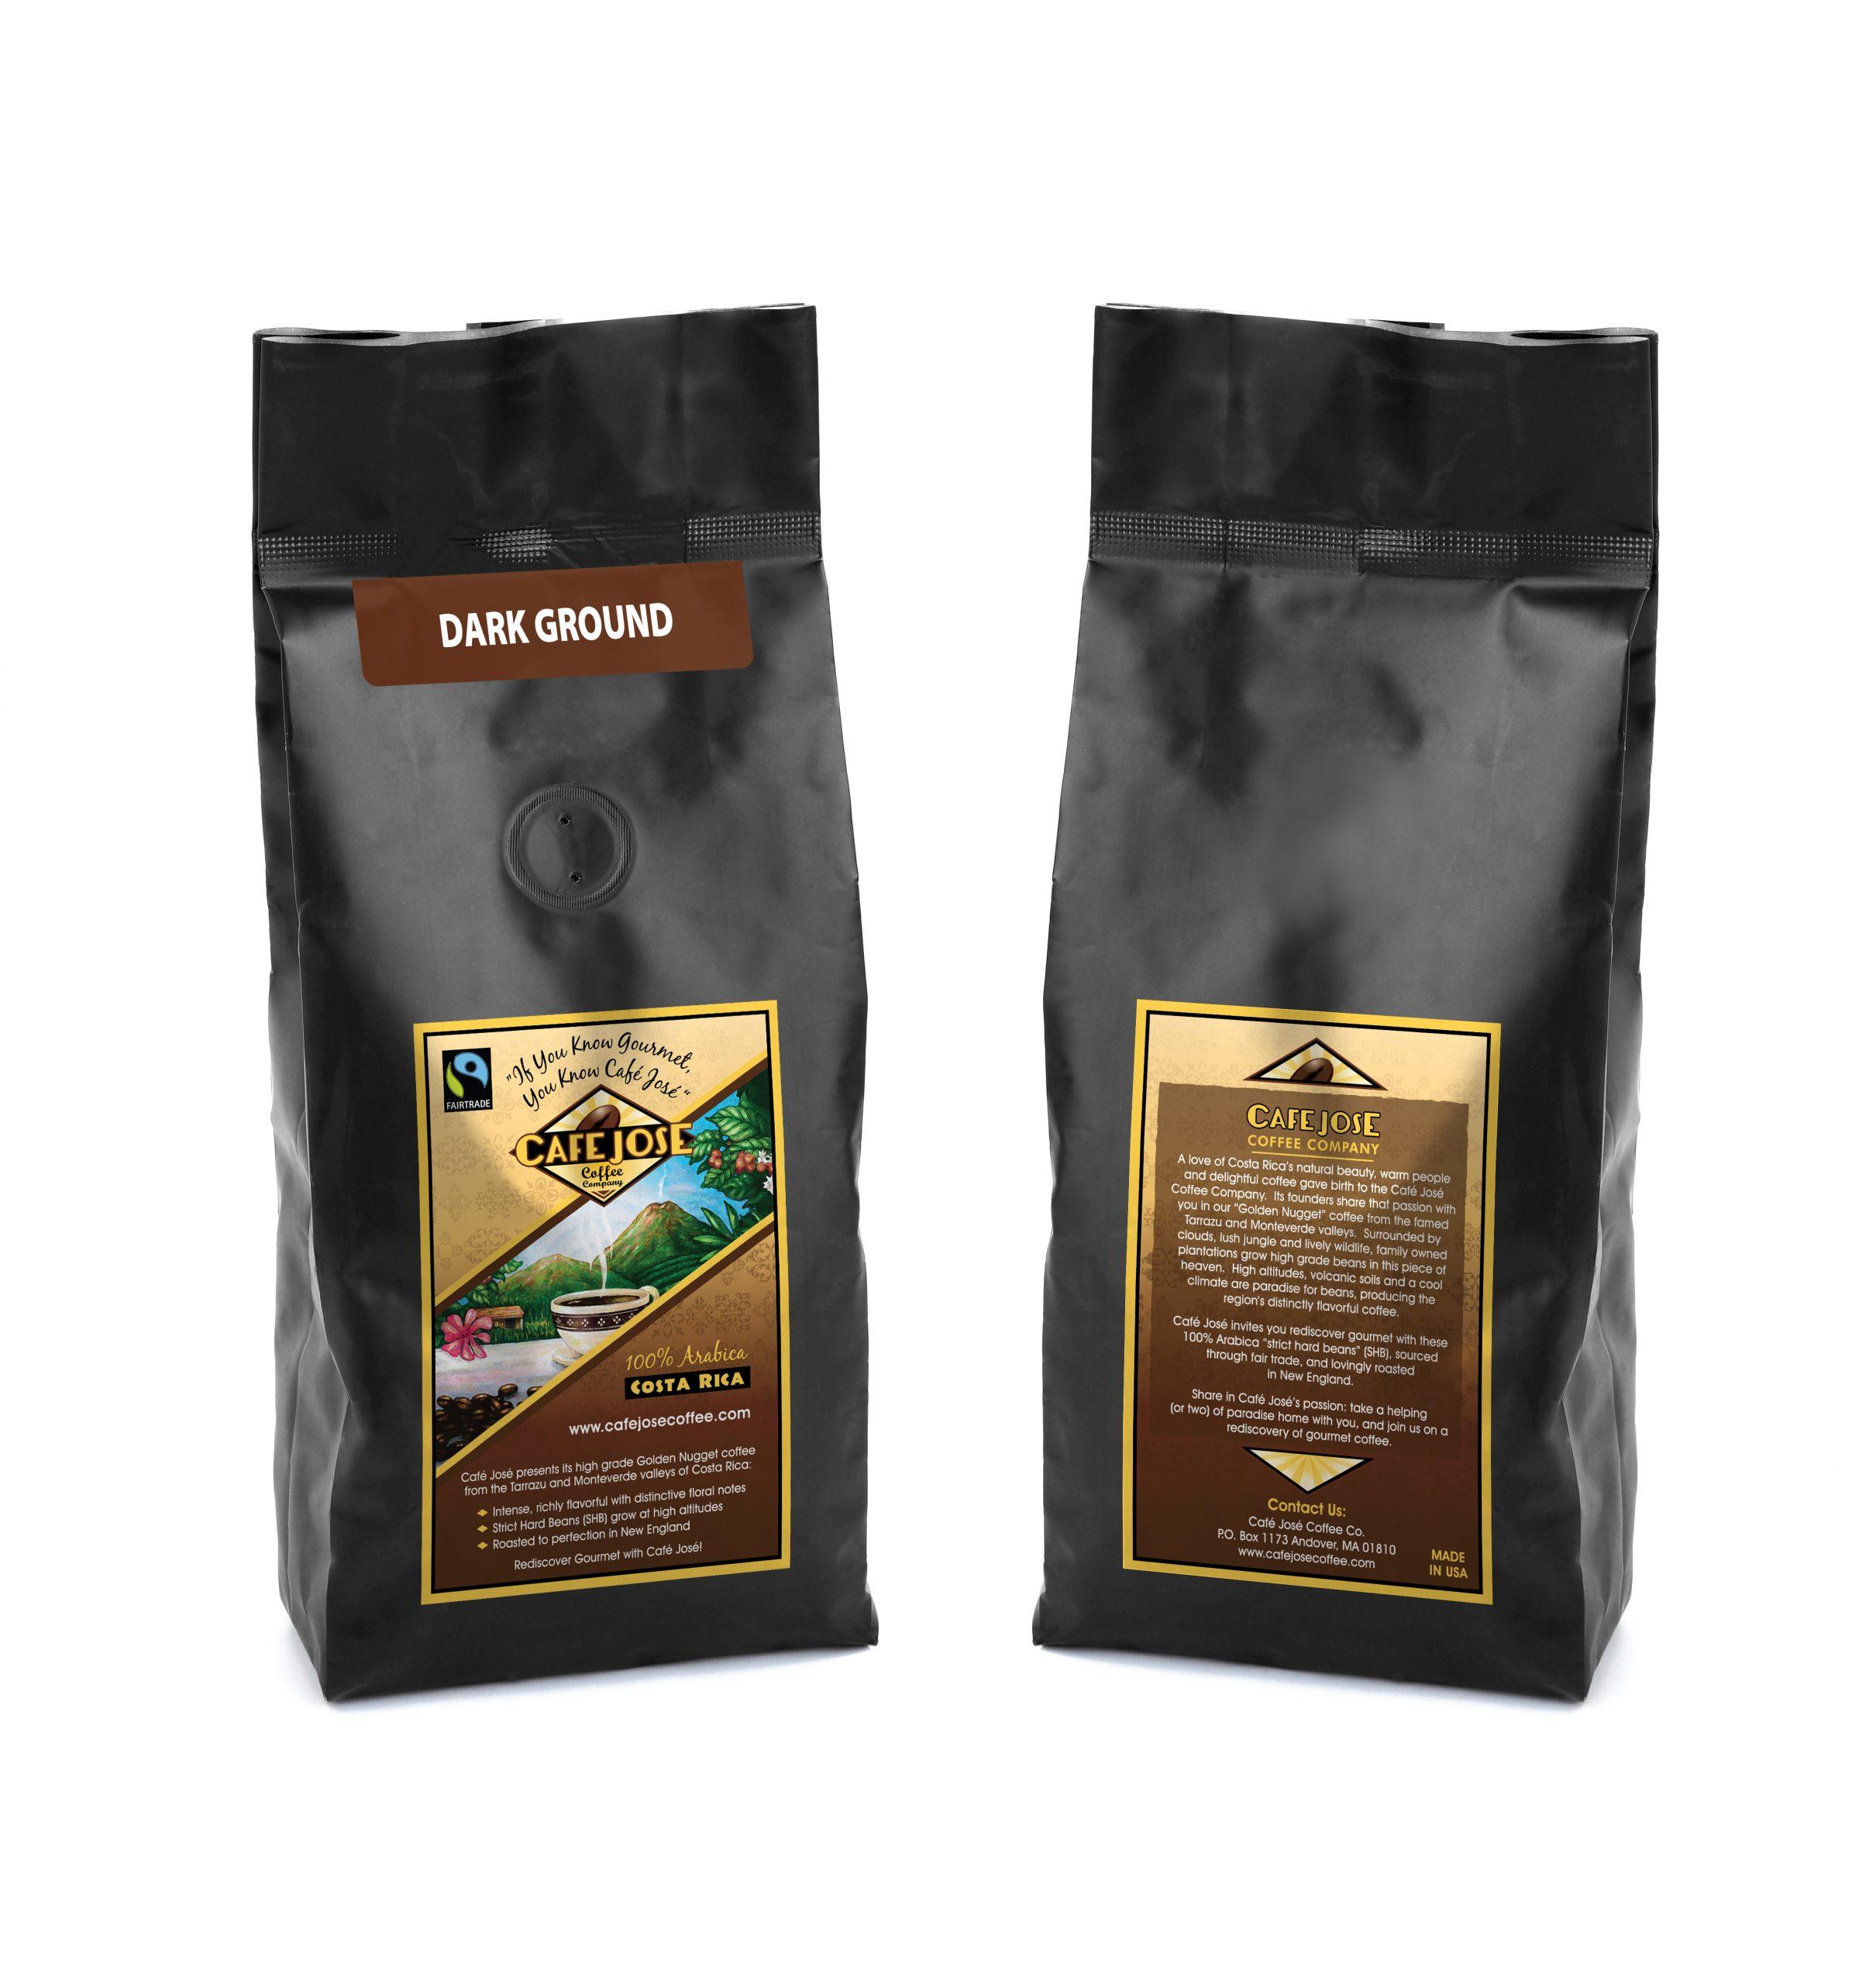 Tarrazu Dark Ground - 2 lb bags